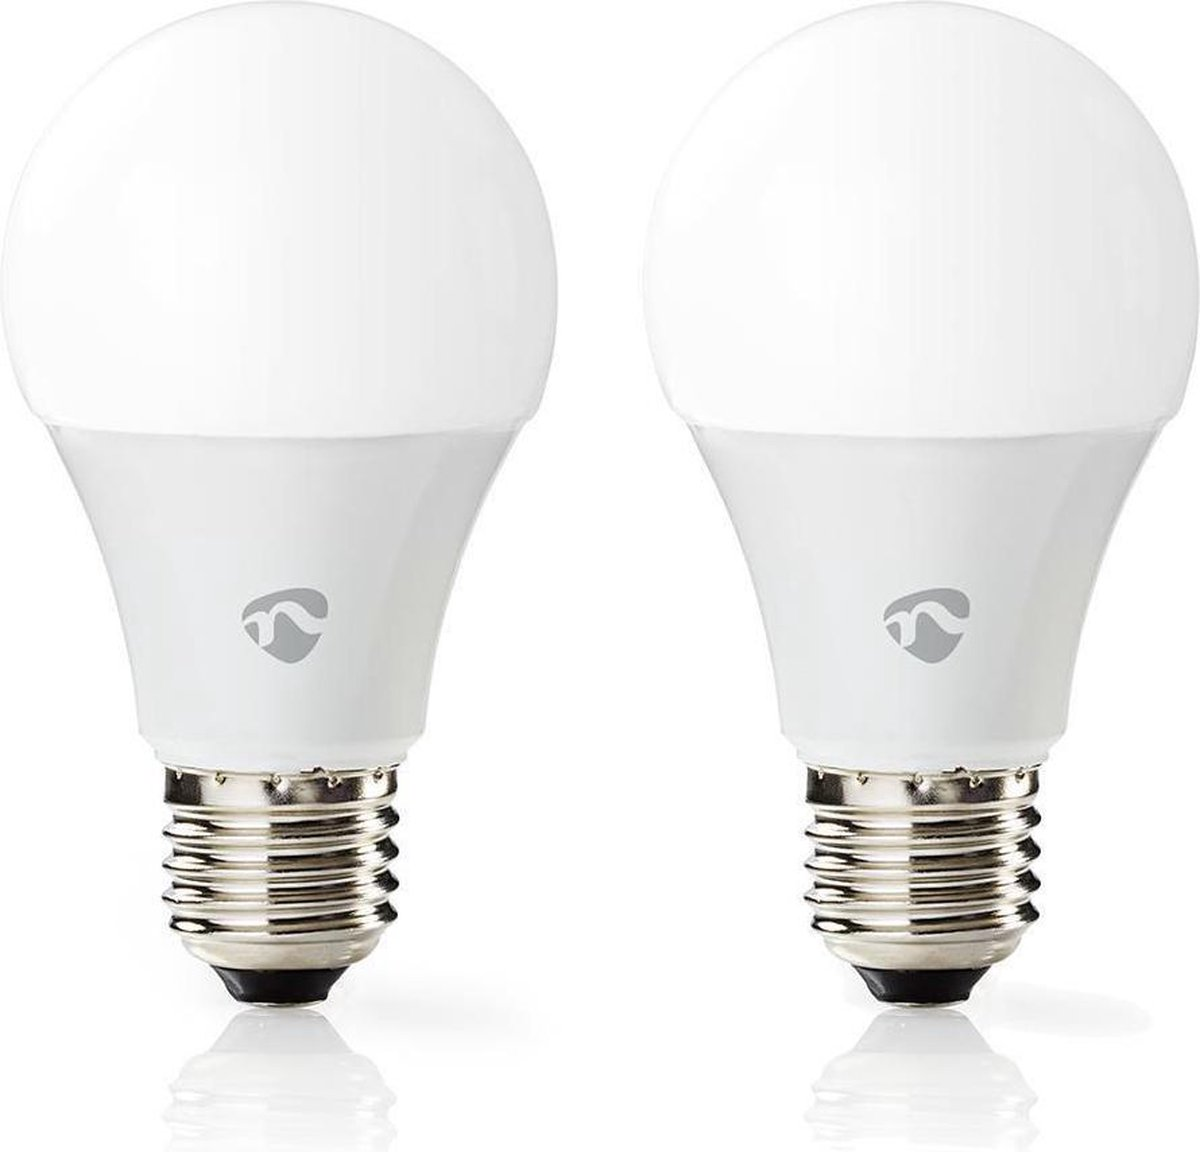 Dimbare Slimme Multi-colour Lamp   2 stuks   E27   470 lm   6 W   Wit / RGB / Warm Wit   RGB + 2700 K   Smartphone app   Wi-Fi